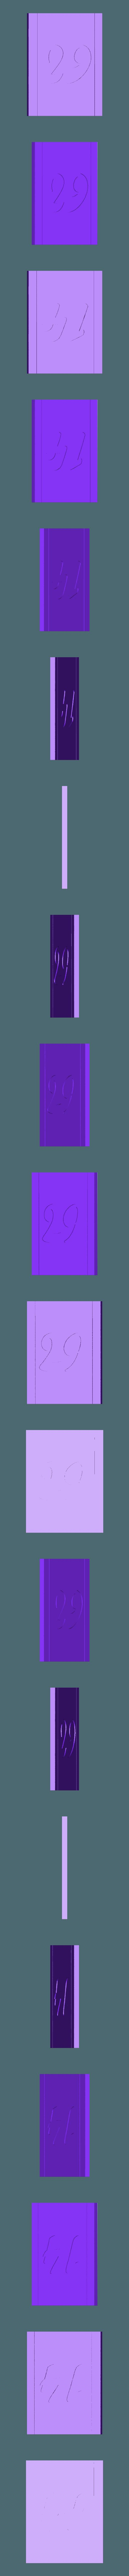 29_-_14.stl Download free SCAD file Perpetual Flip Calendar (W/ Customizable Font) • 3D printable model, Dsk